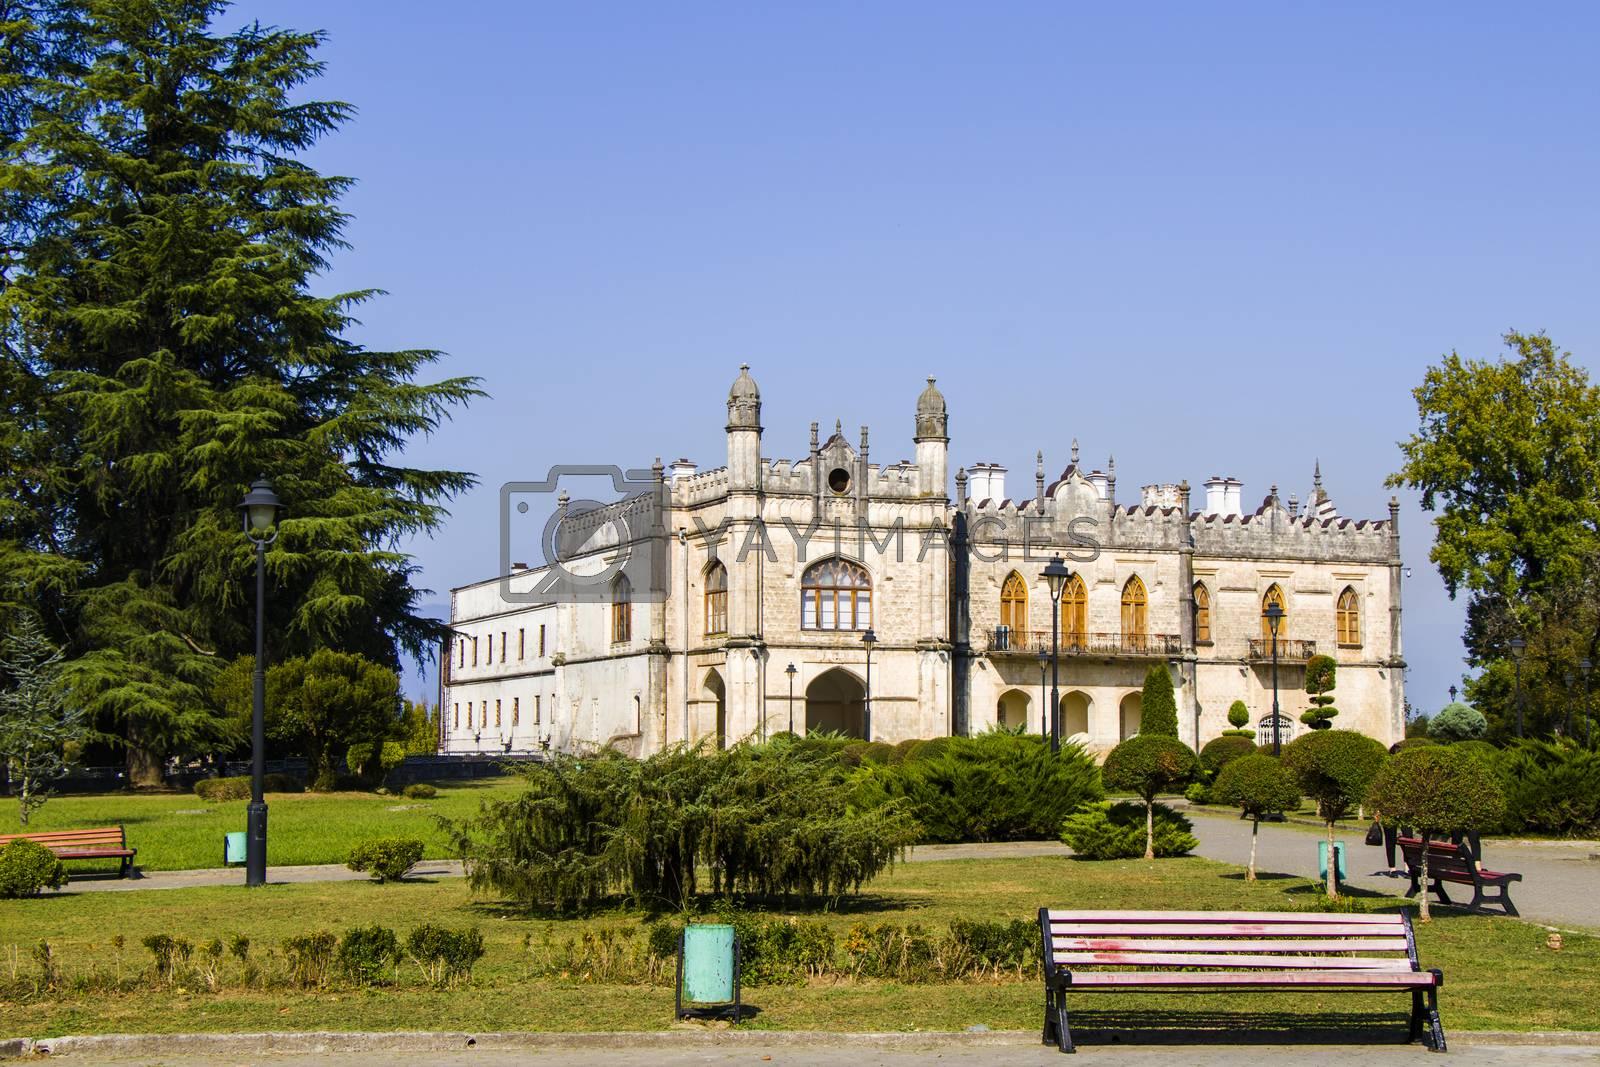 Dadiani palace in Zugdidi, Georgia. Daytime and sunlight